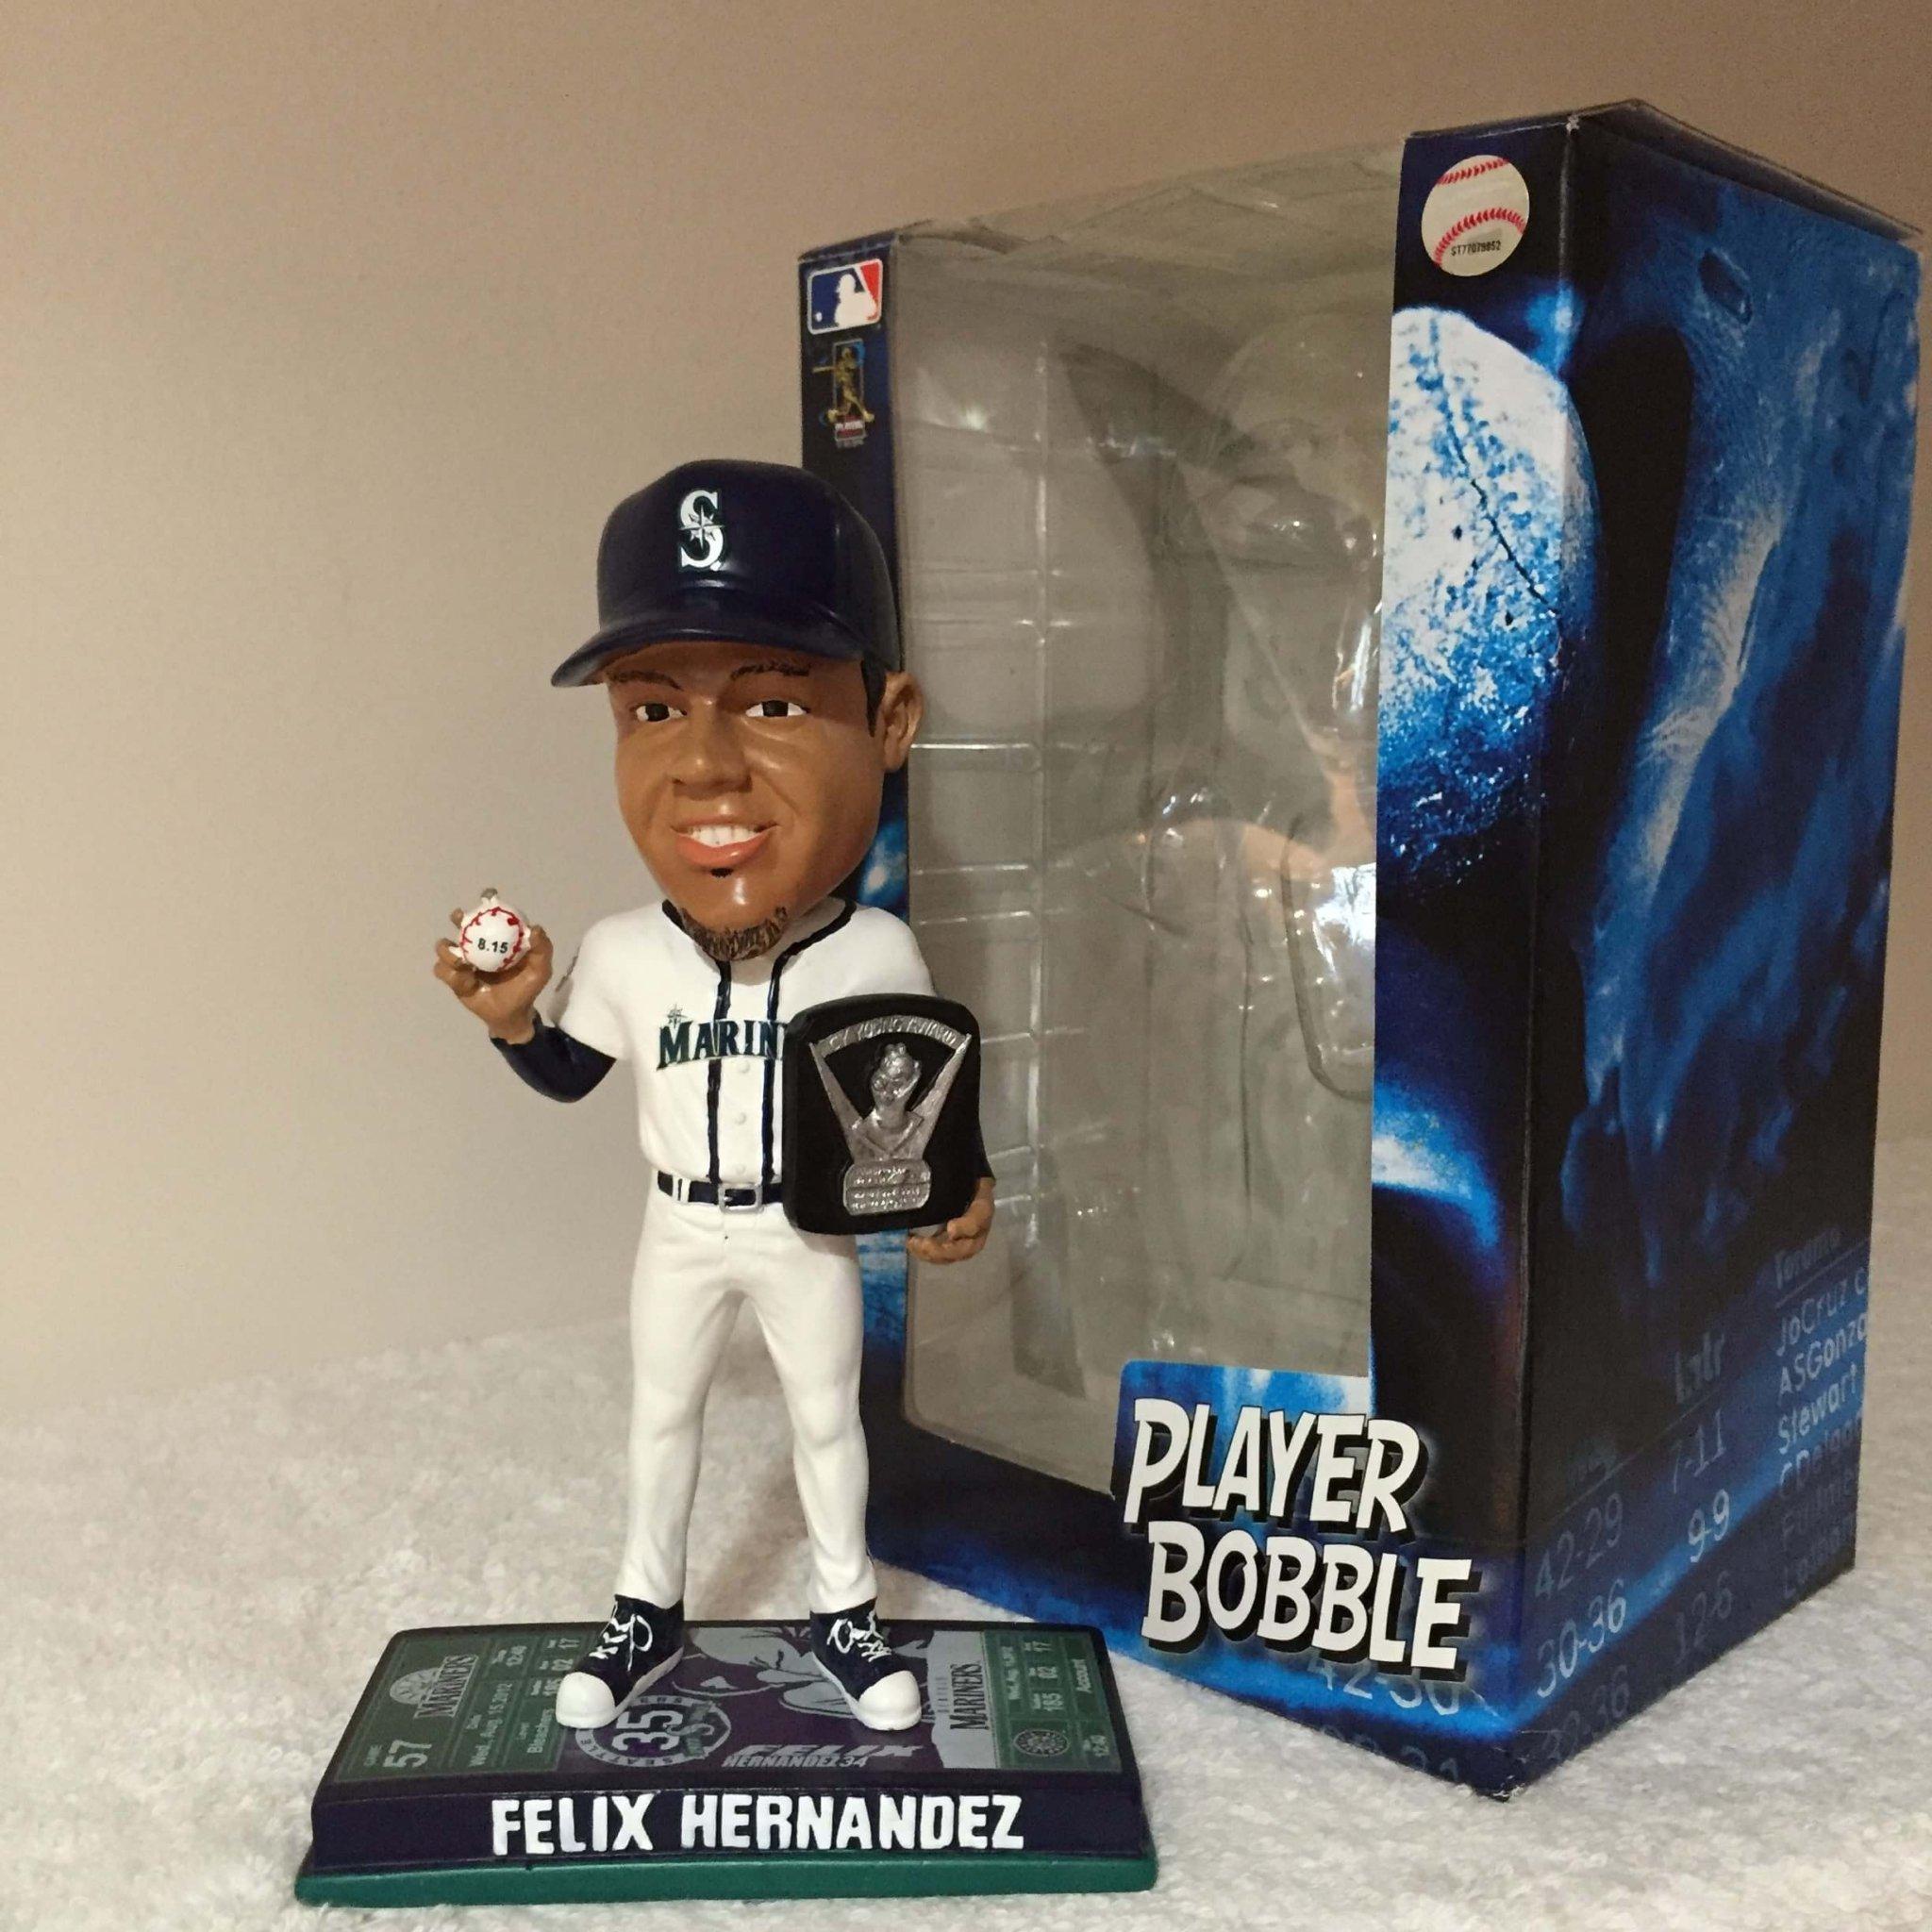 Felix Hernandez